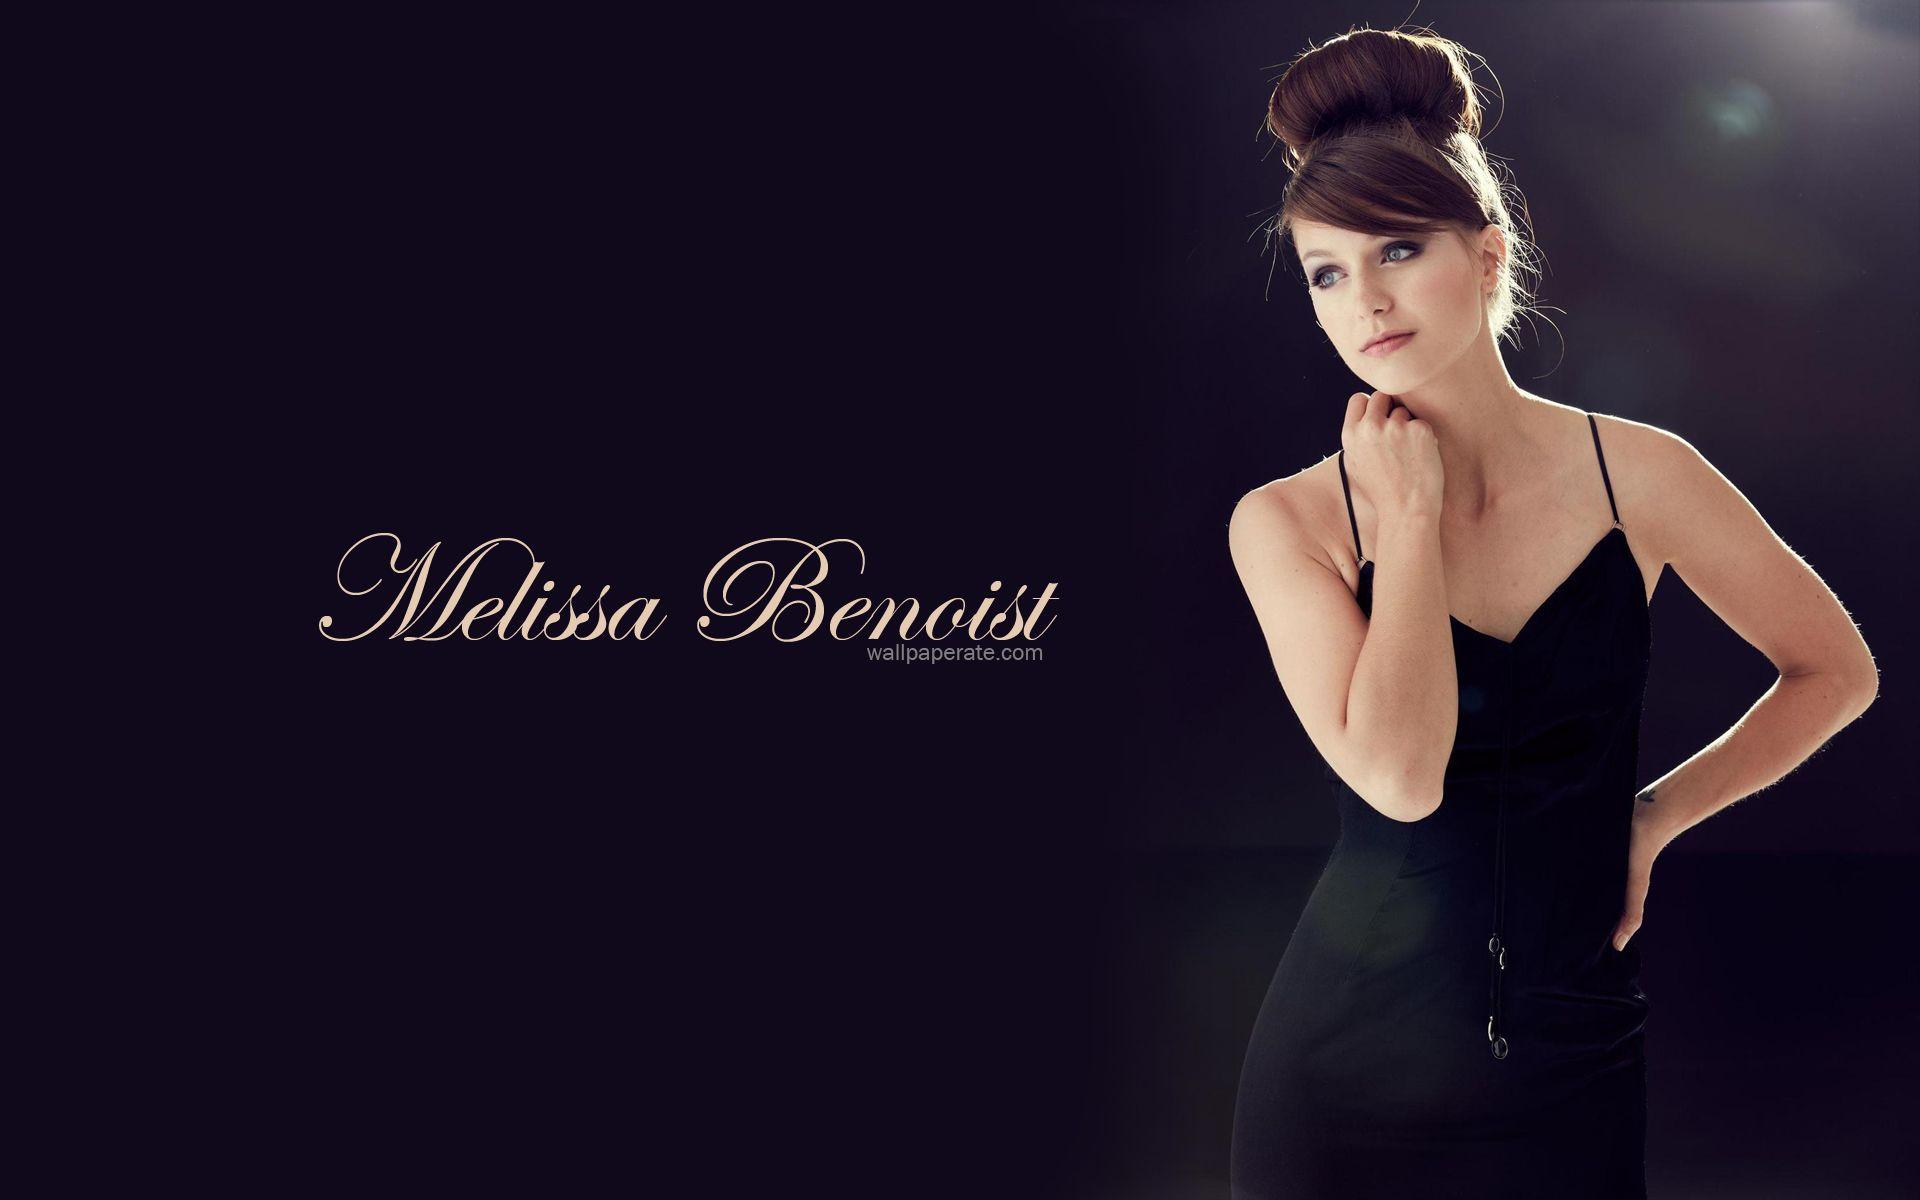 Melissa Benoist Hot Wallpaper